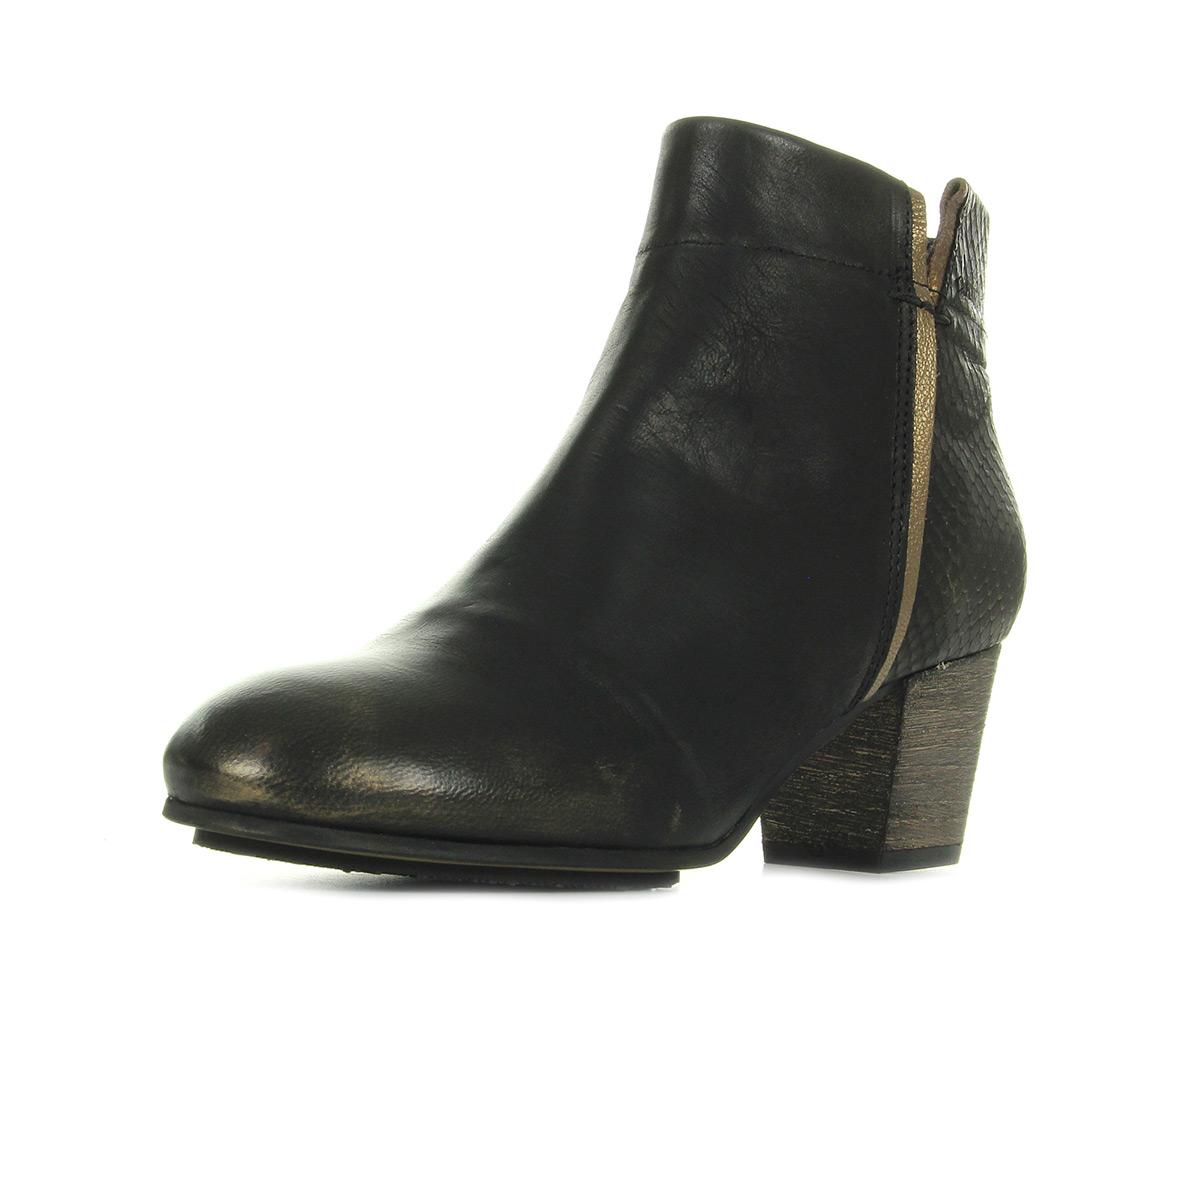 Marques Chaussure femme P-L-D-M By Palladium femme PARLEY SNT Black